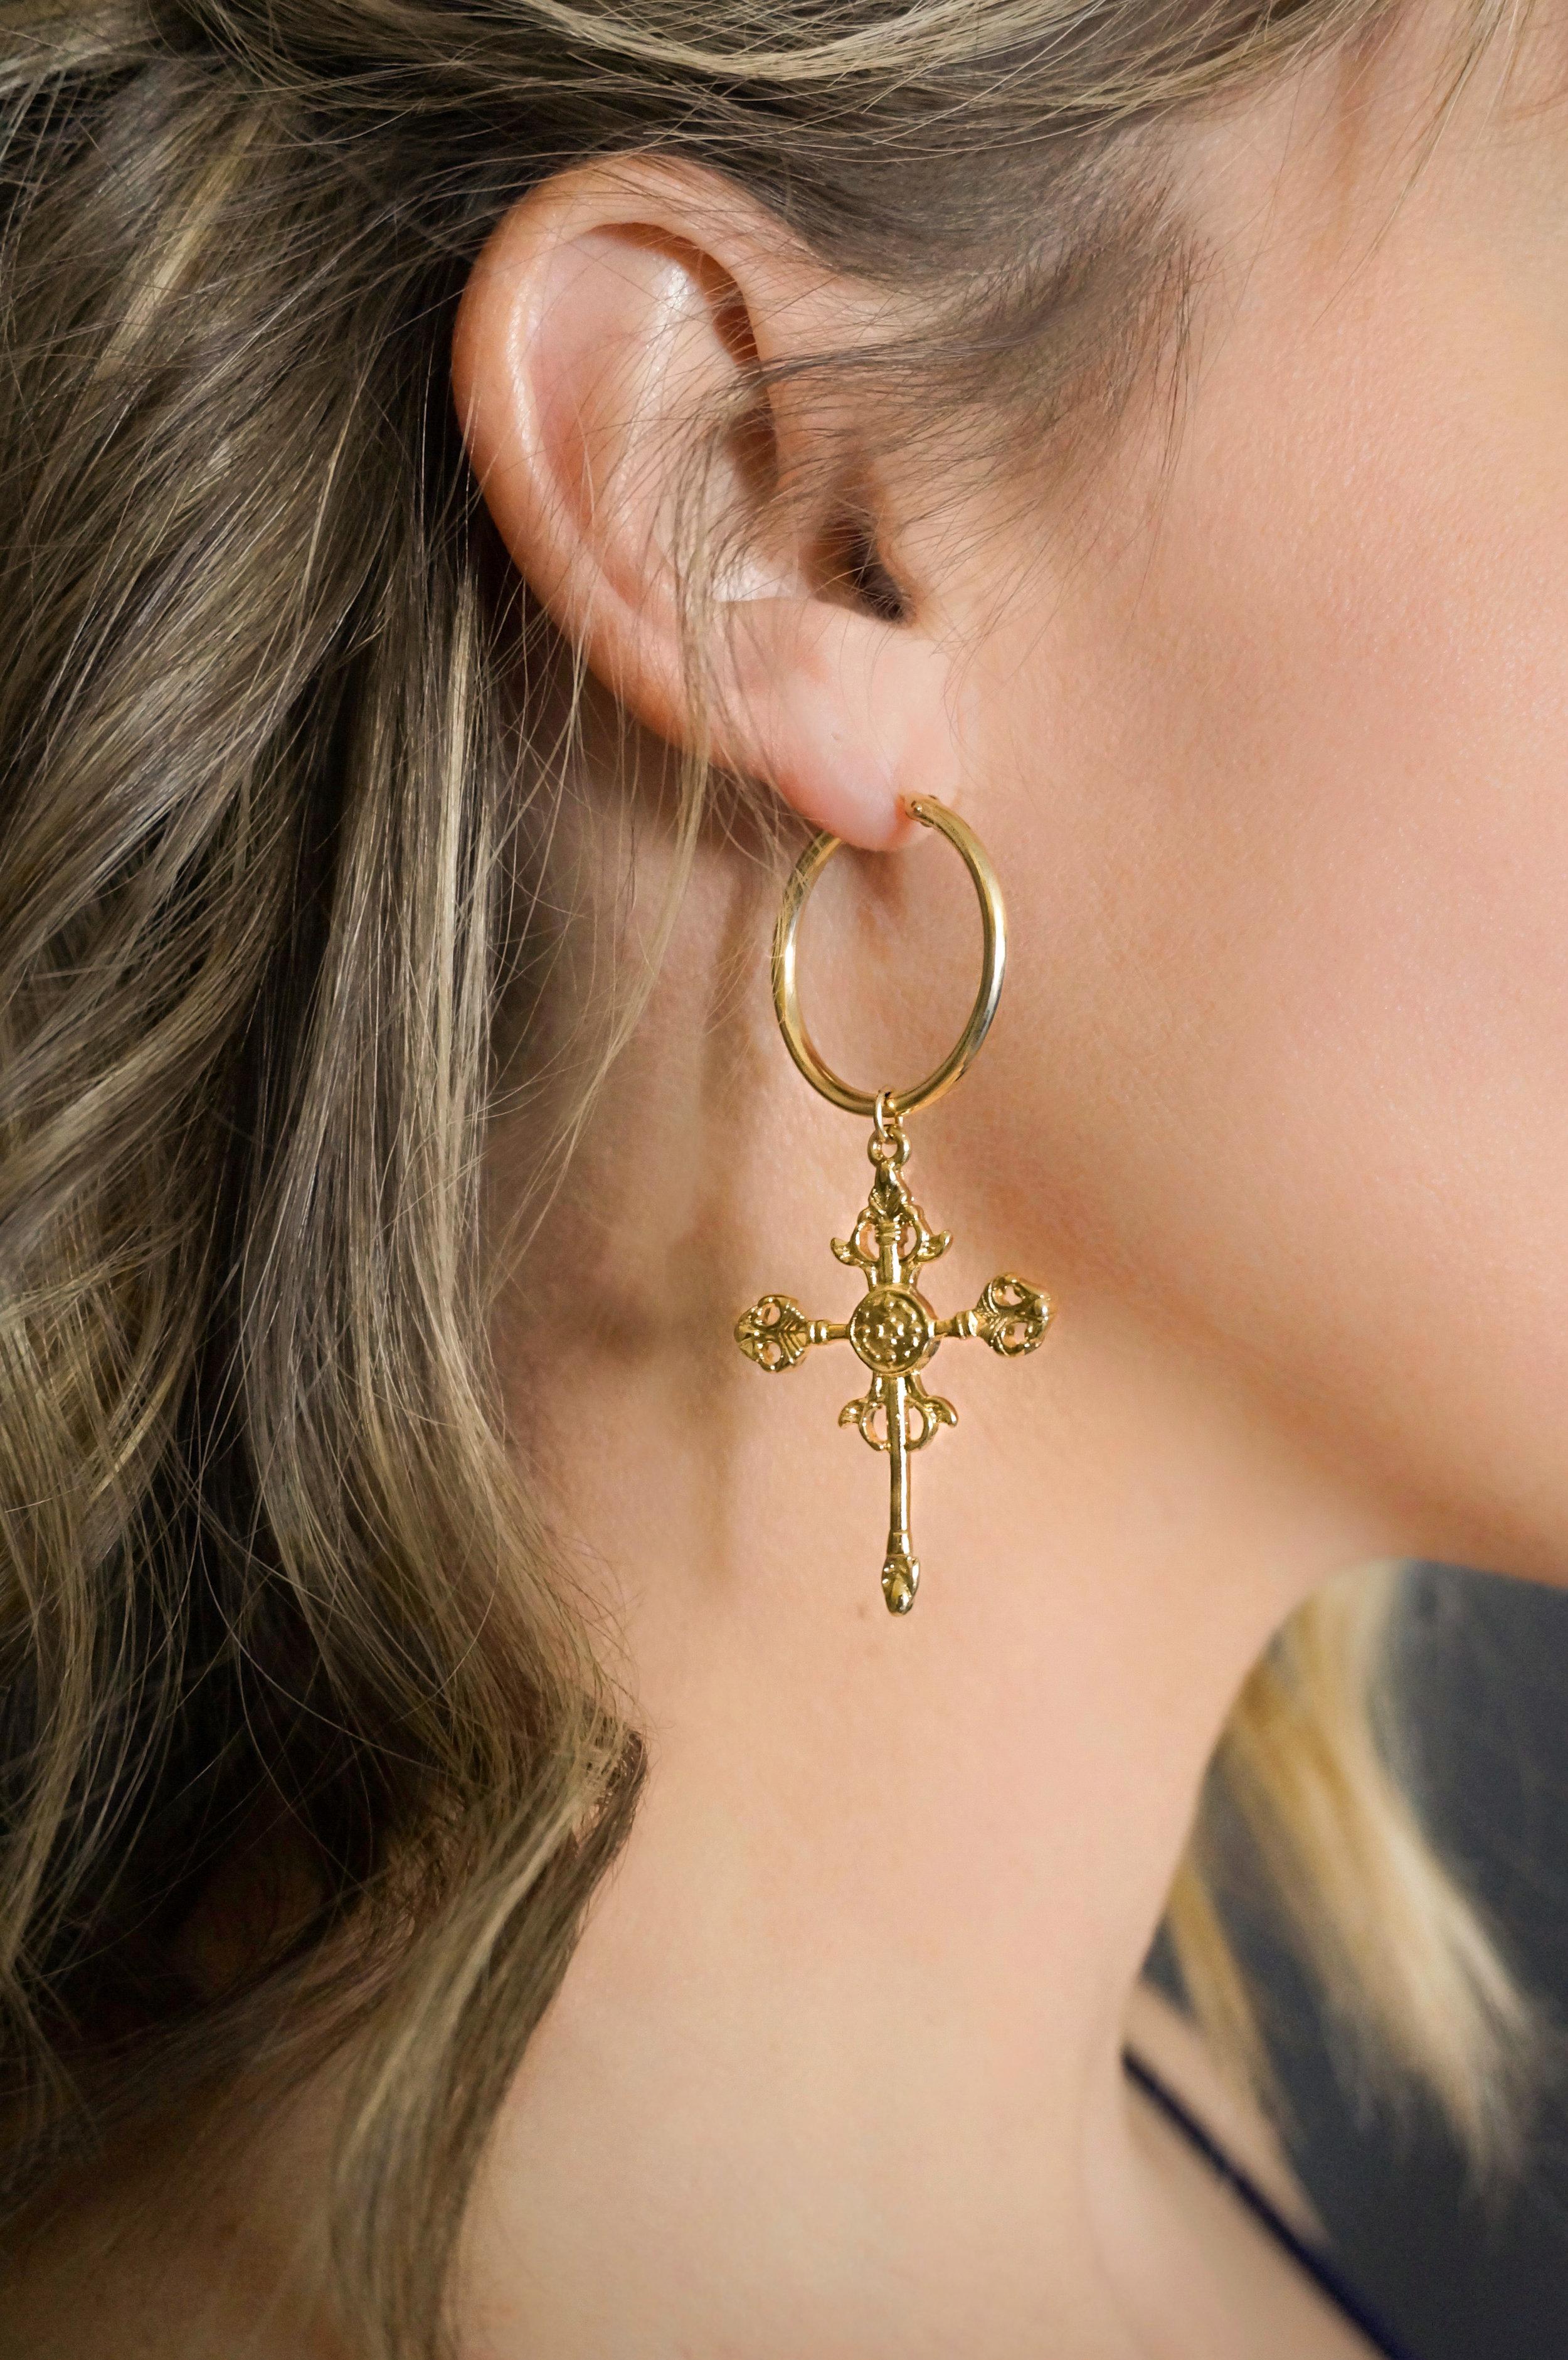 MIRO vibiana earring - more exposed etc earring(1).jpg